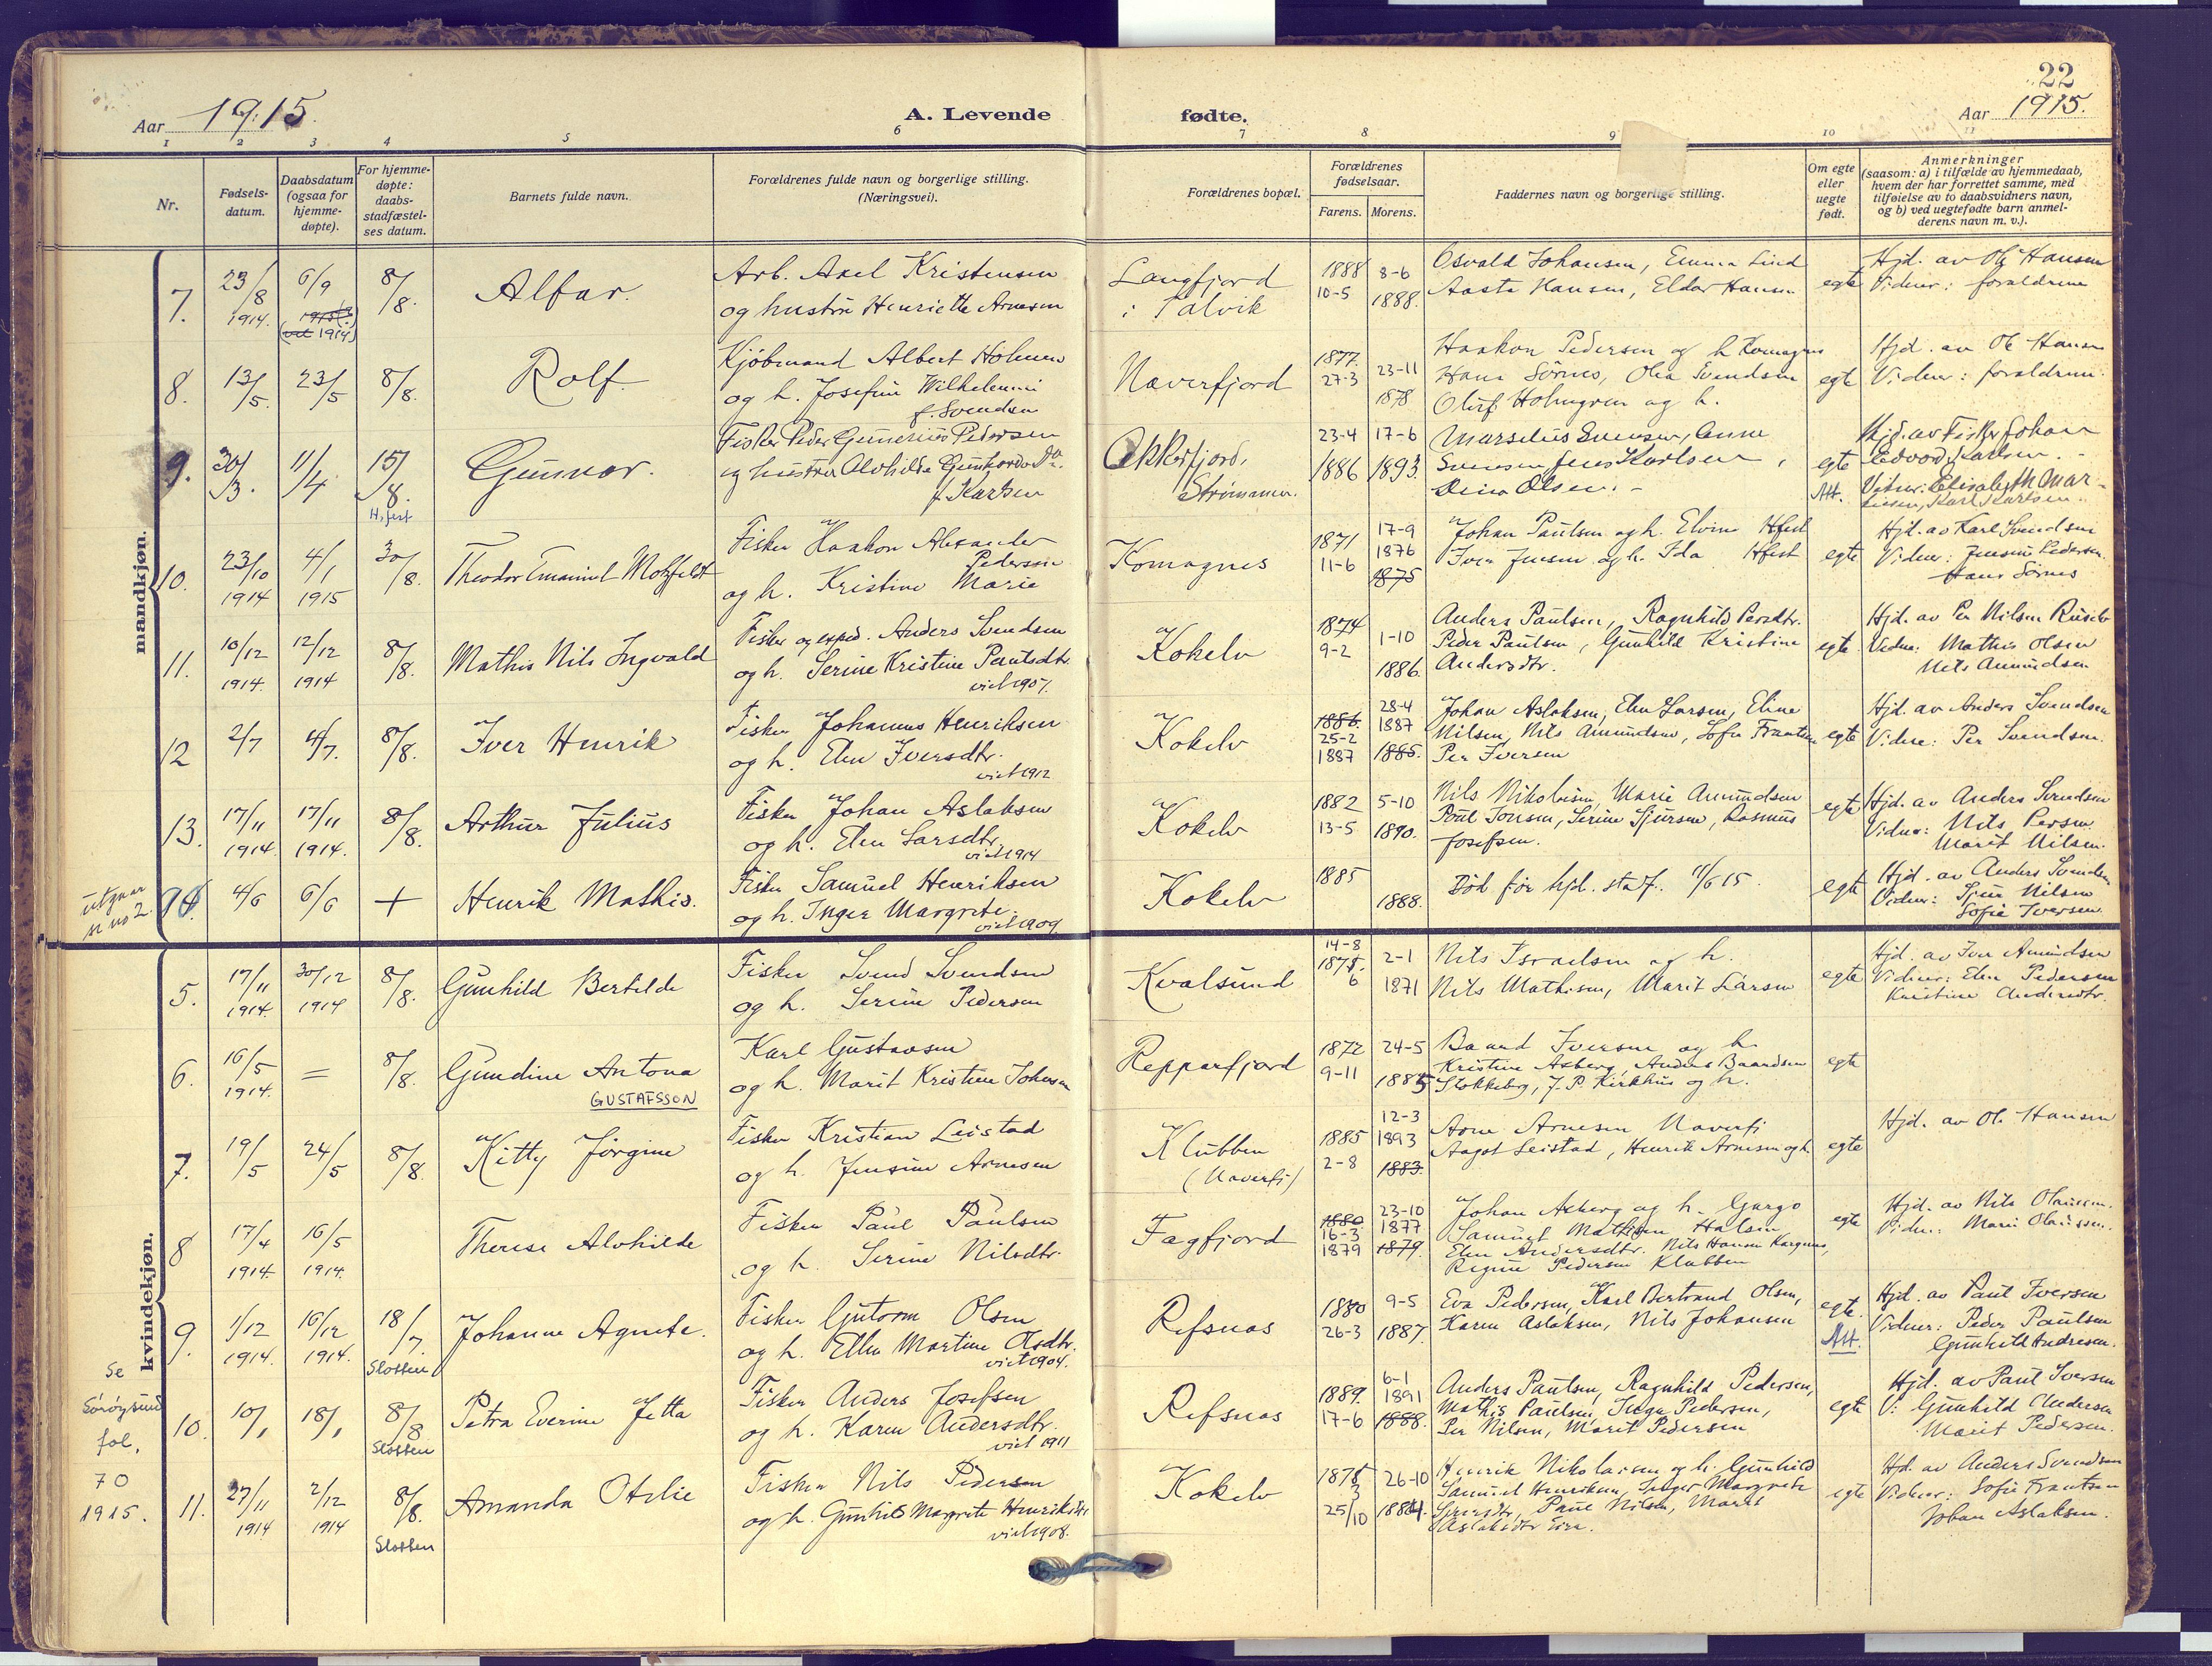 SATØ, Hammerfest sokneprestembete, Ministerialbok nr. 16, 1908-1923, s. 22